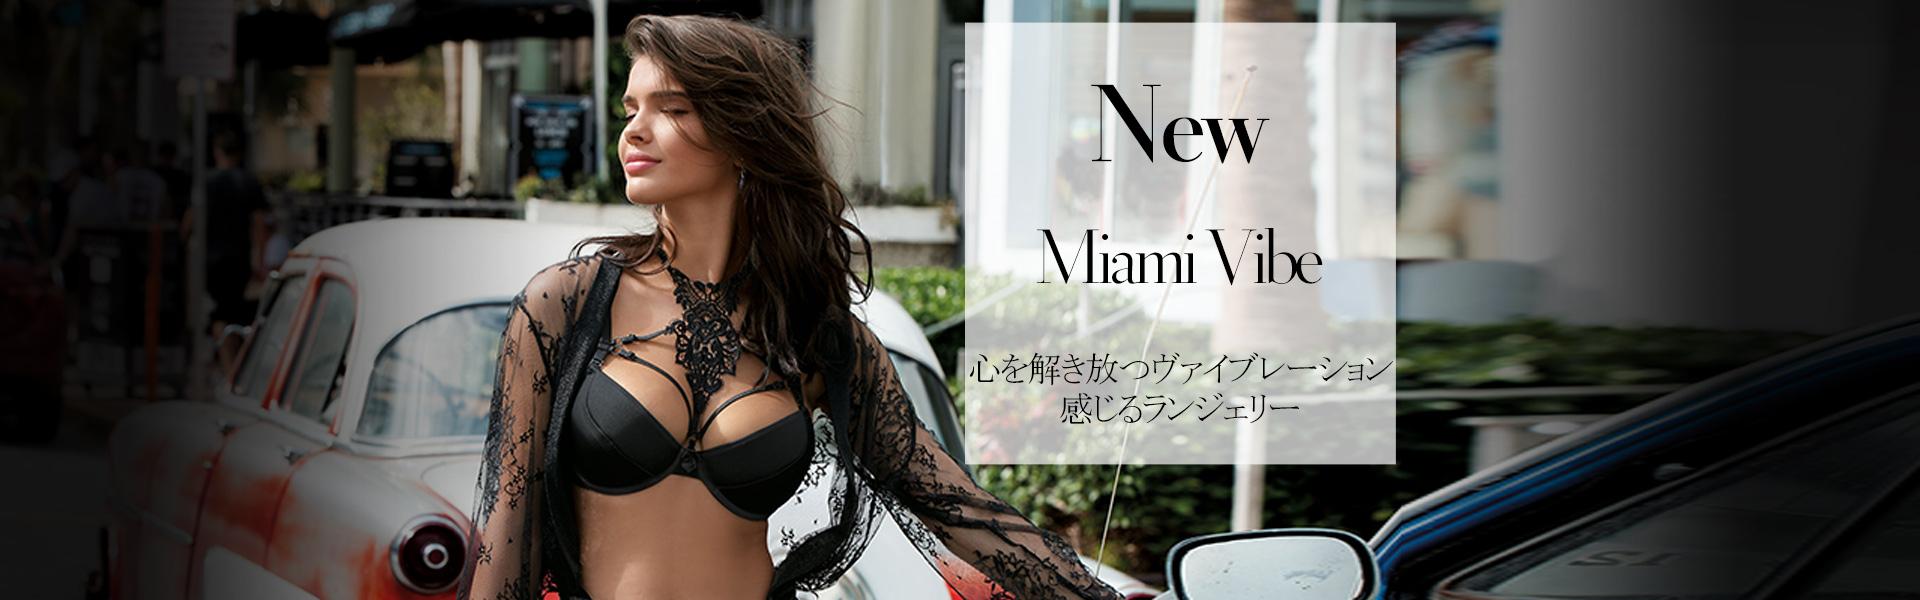 [Axami Luxury]Miami Vibe Collection